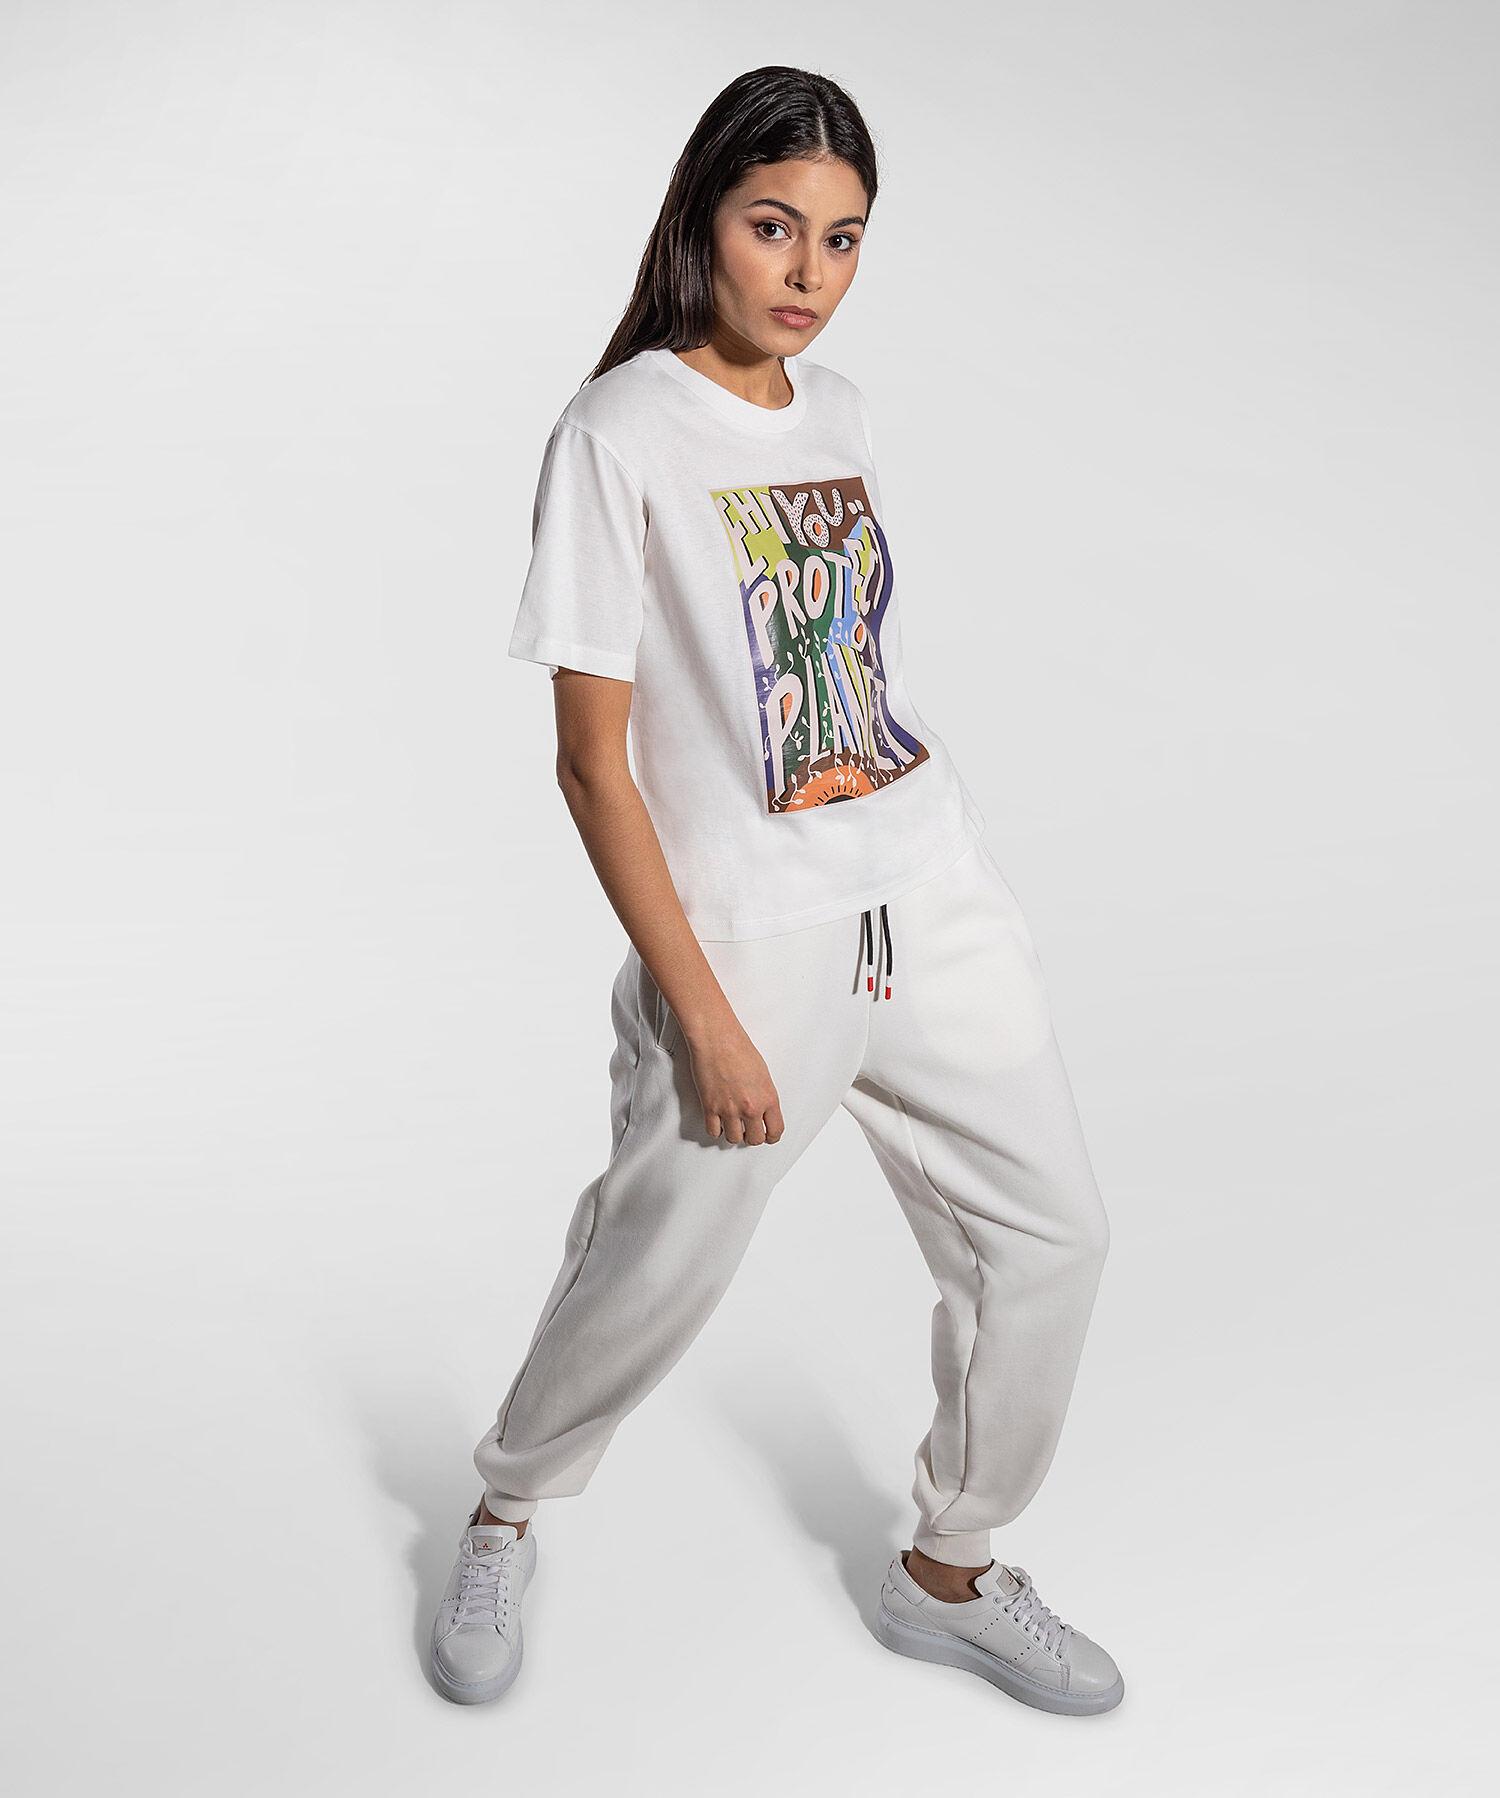 T-Shirt Con Claim Eco - Peuterey